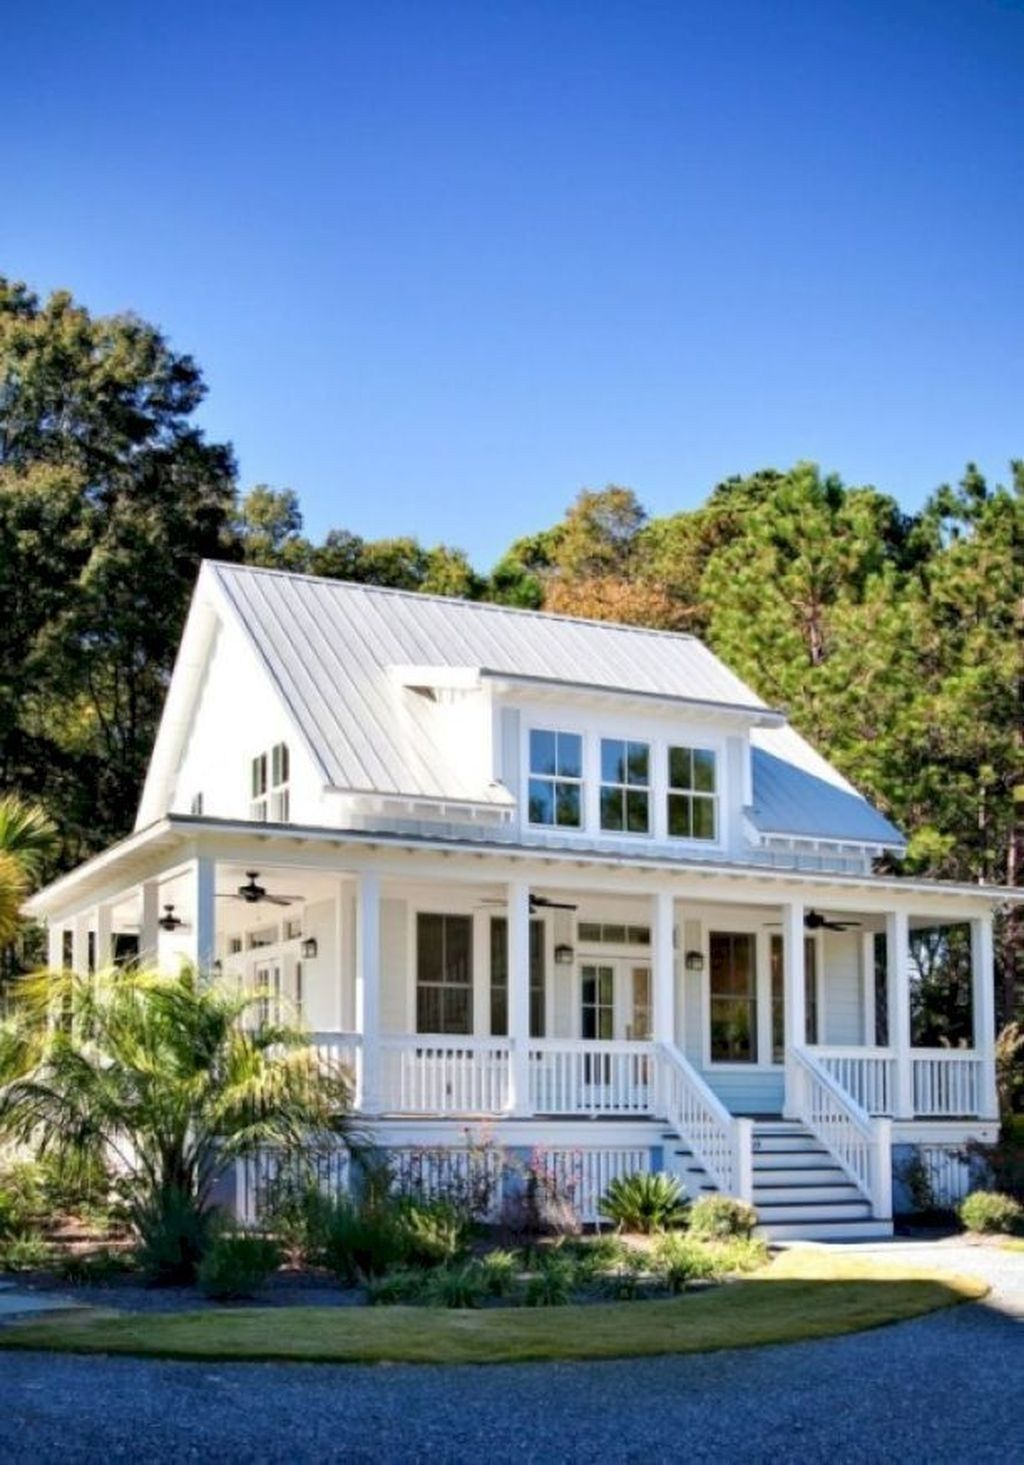 Beautiful Exterior House Colors Design: Beautify Your Exterior Design With These Beautiful House